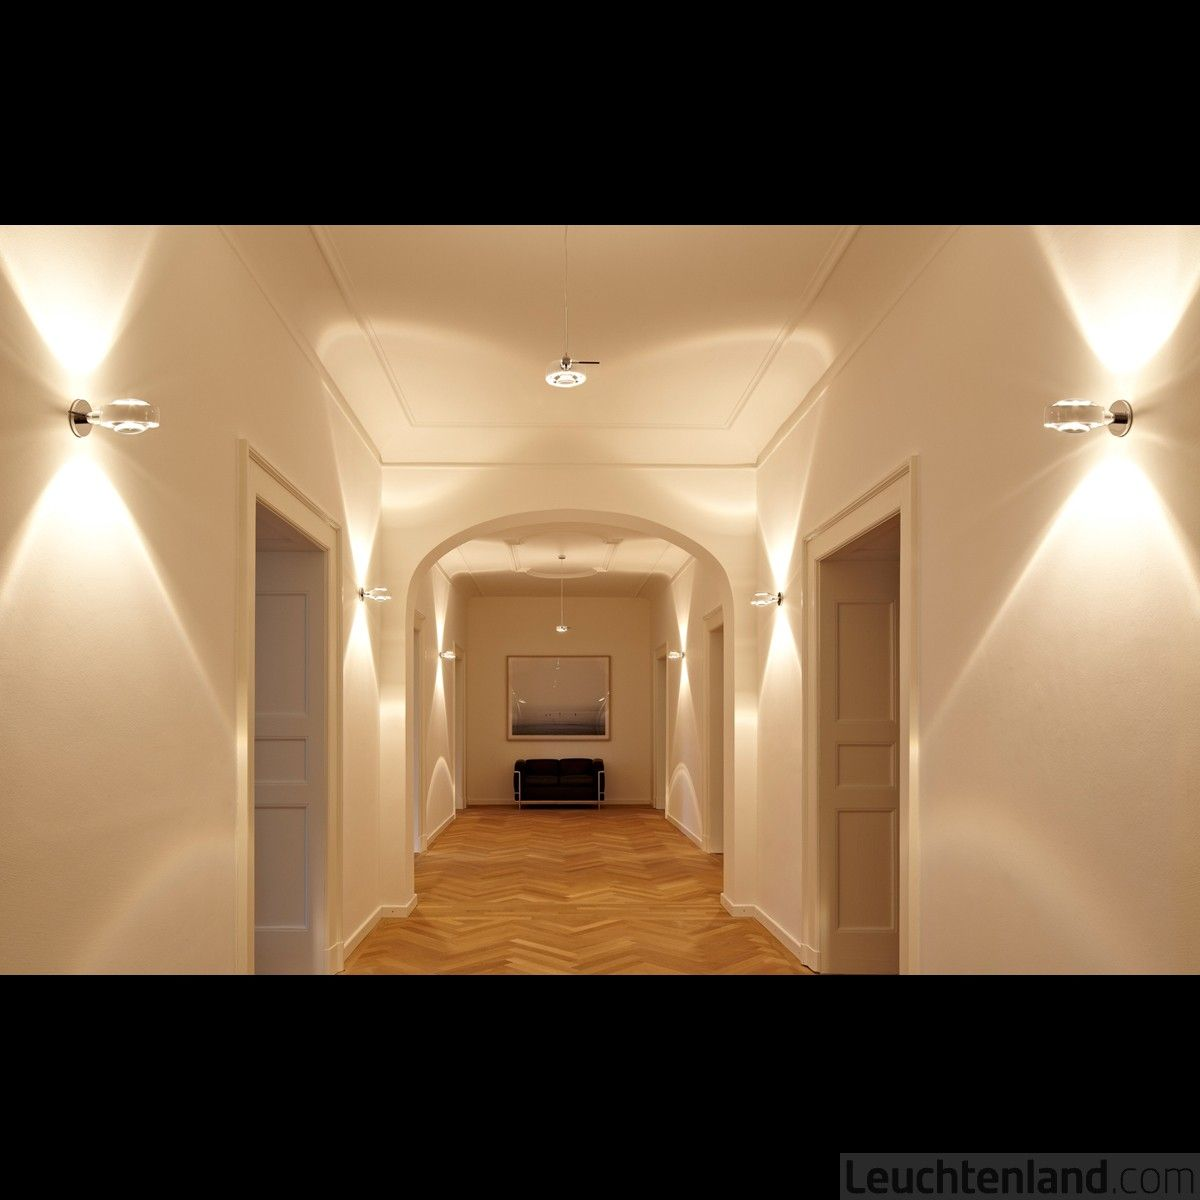 occhio leuchten alternative wohn design. Black Bedroom Furniture Sets. Home Design Ideas